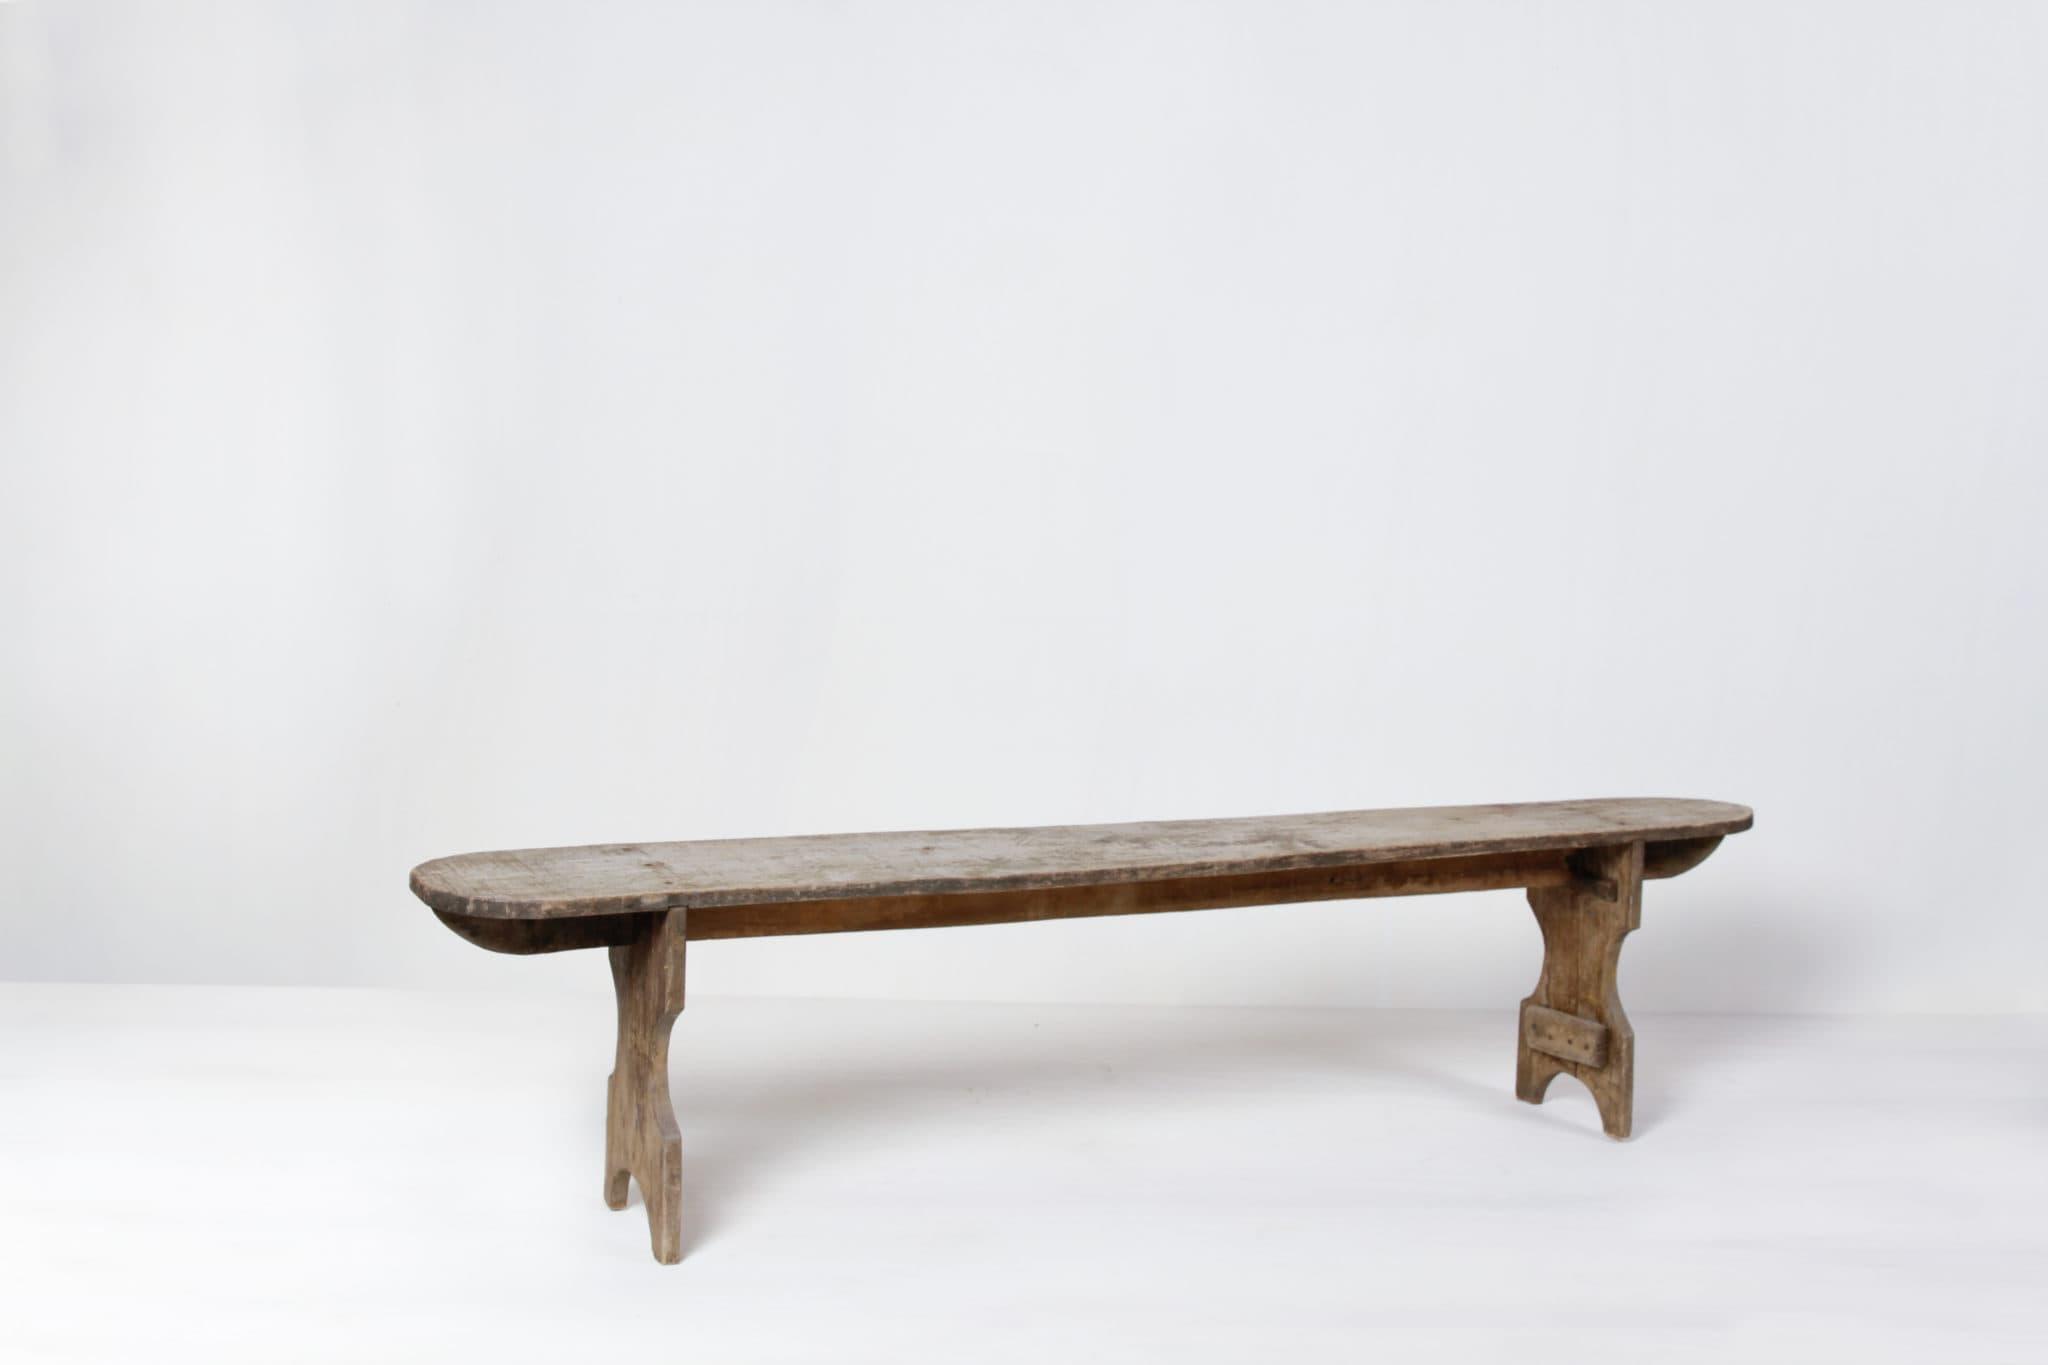 Sitzbänke aus Holz mieten